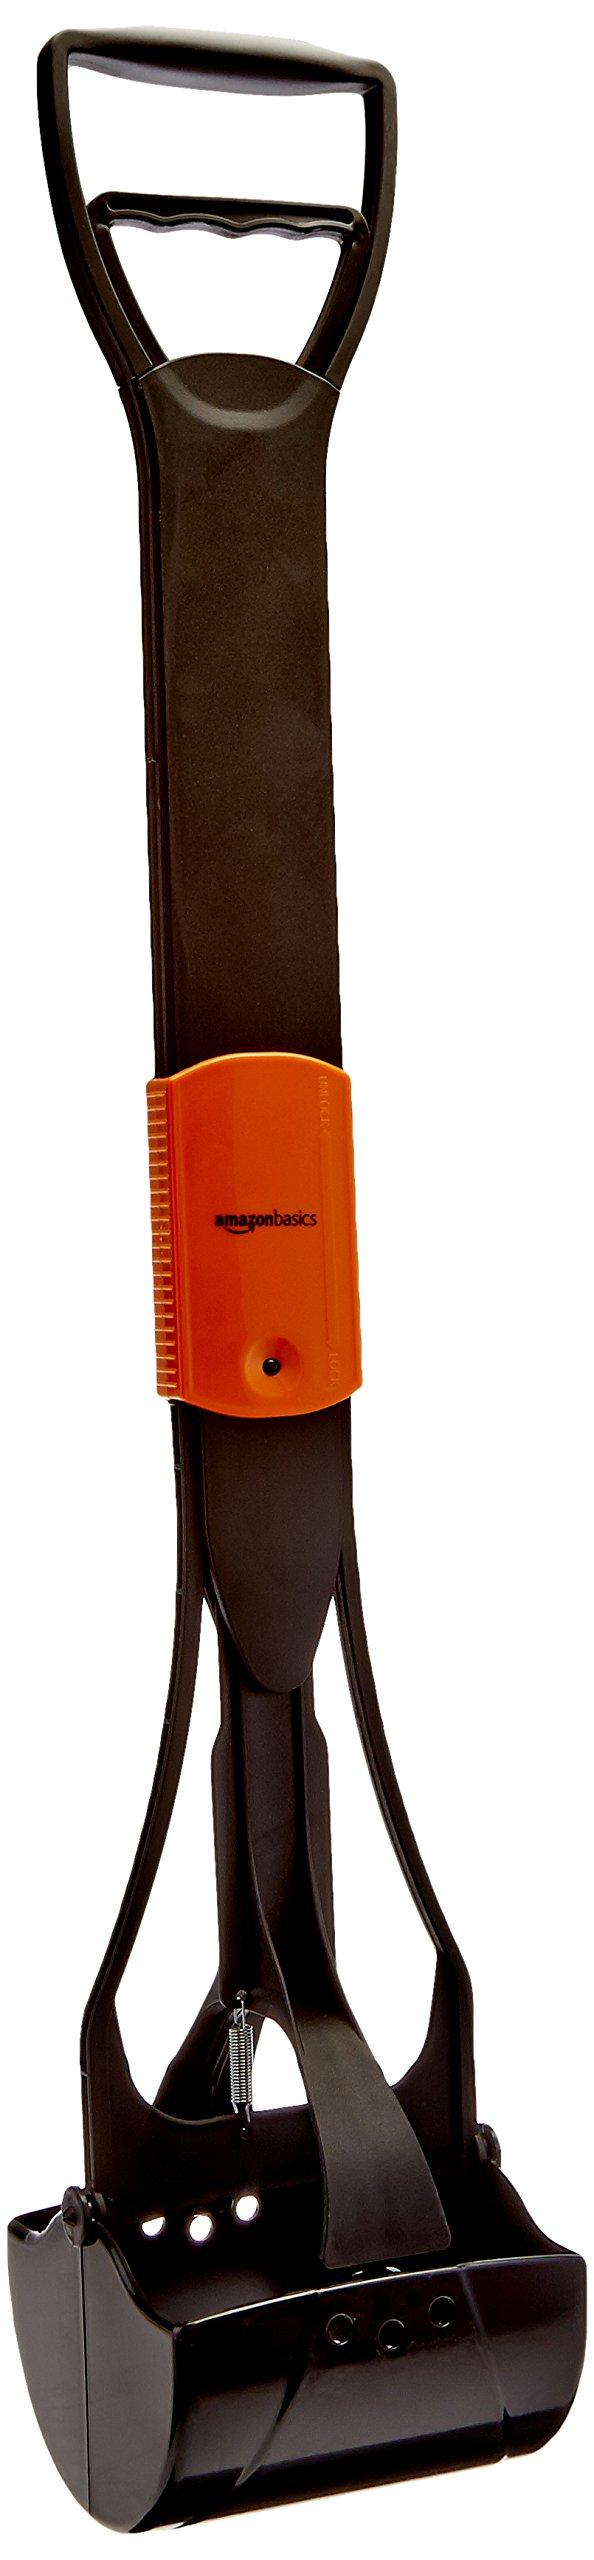 AmazonBasics Jaw Clamp Scooper - 36-Inch